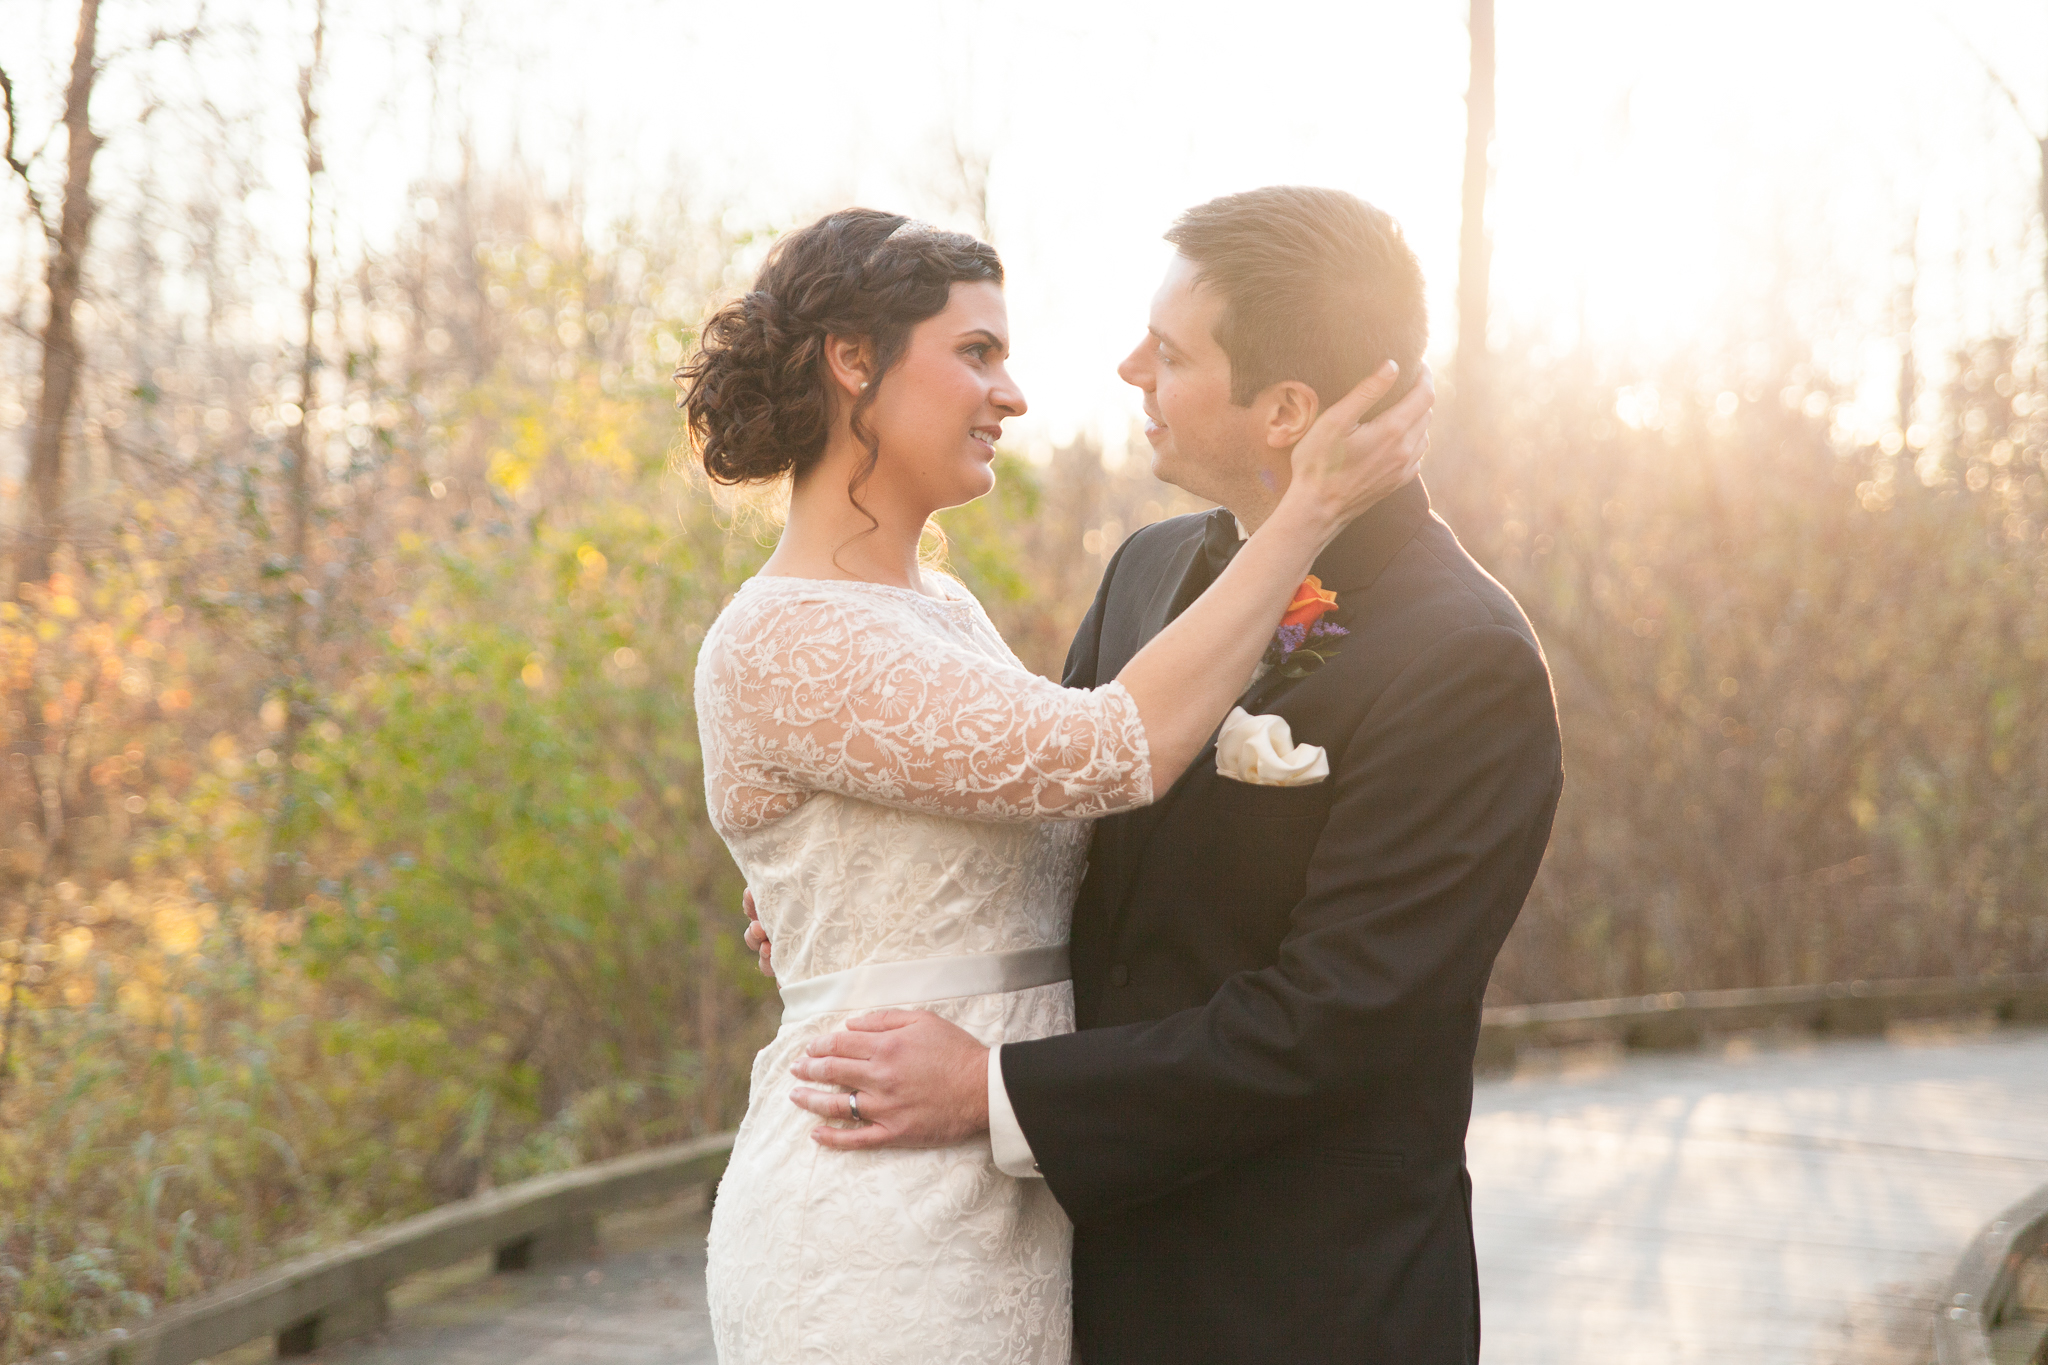 camuglia-whomstudio-chelsea_and_andy-nycphotographer-wedding-brooklyn-buffalo-timberlodge-053-0434.jpg